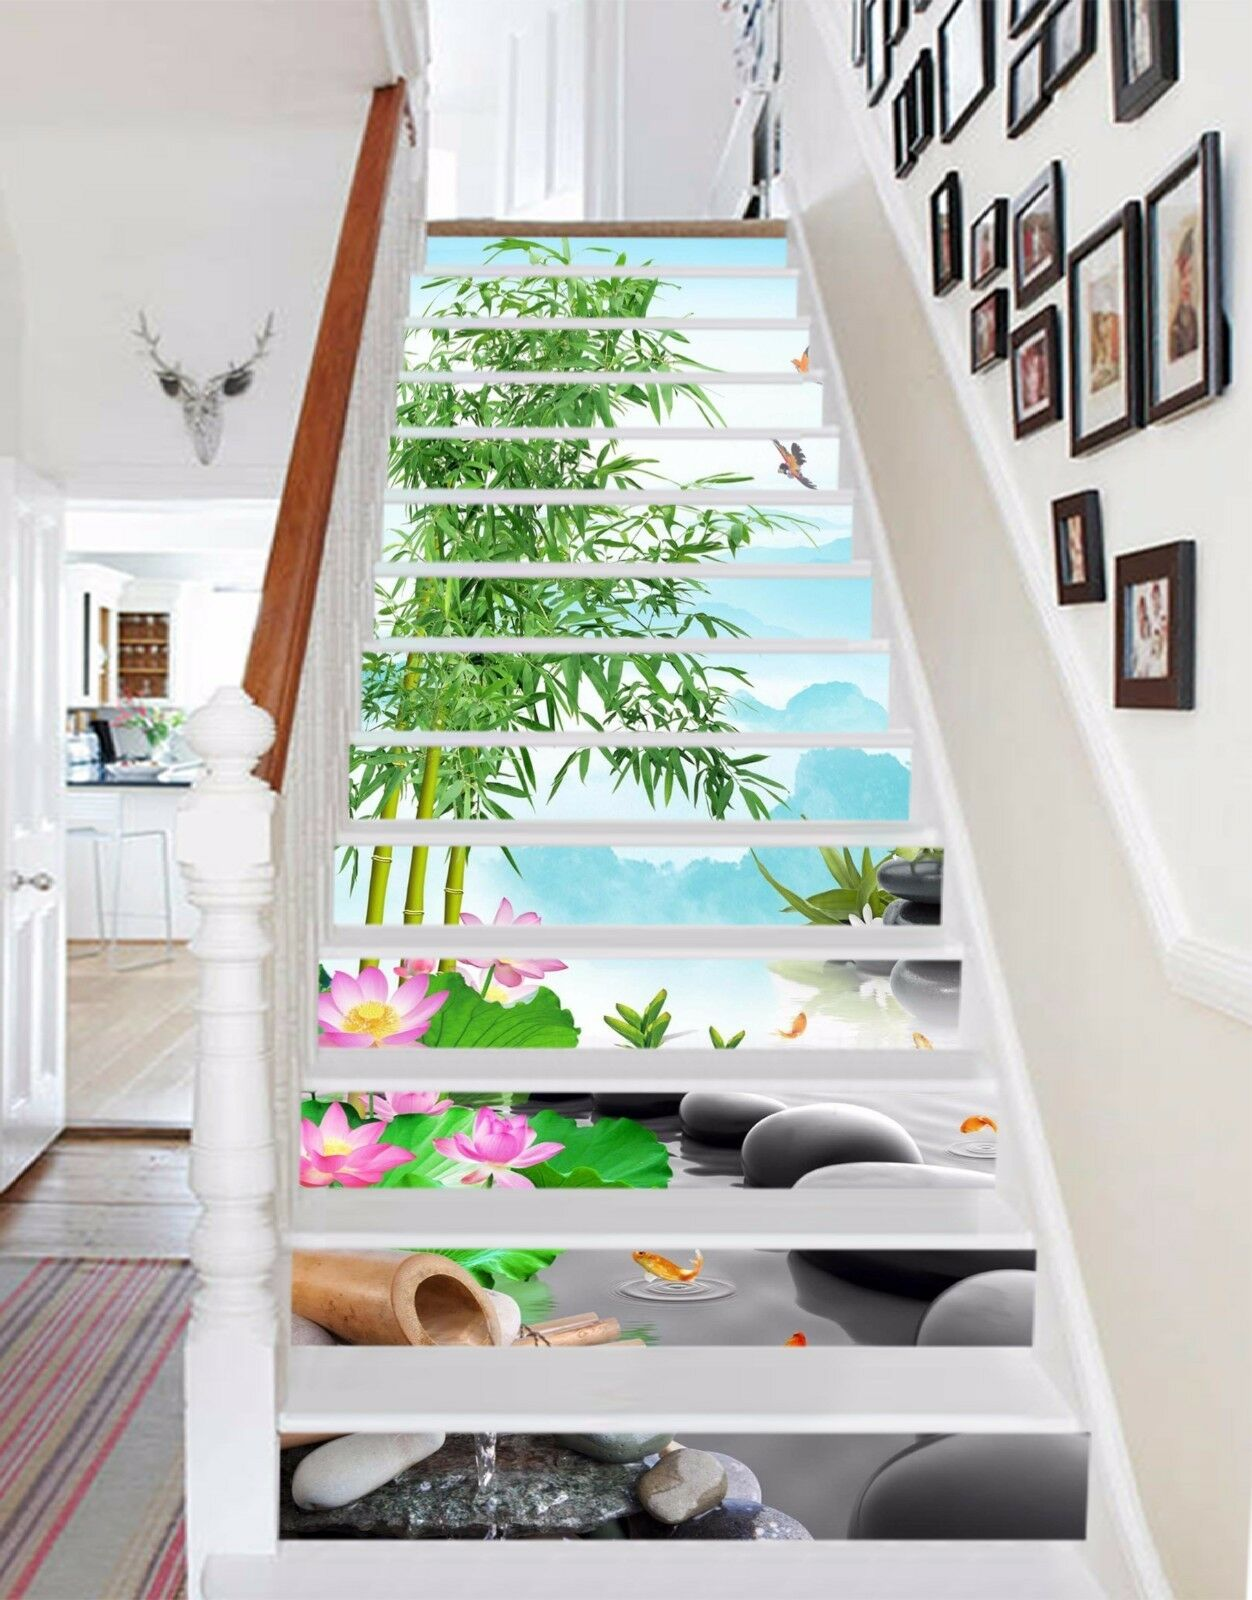 3D Bamboo grove 5 Stair Risers Decoration Photo Mural Vinyl Decal Wallpaper UK